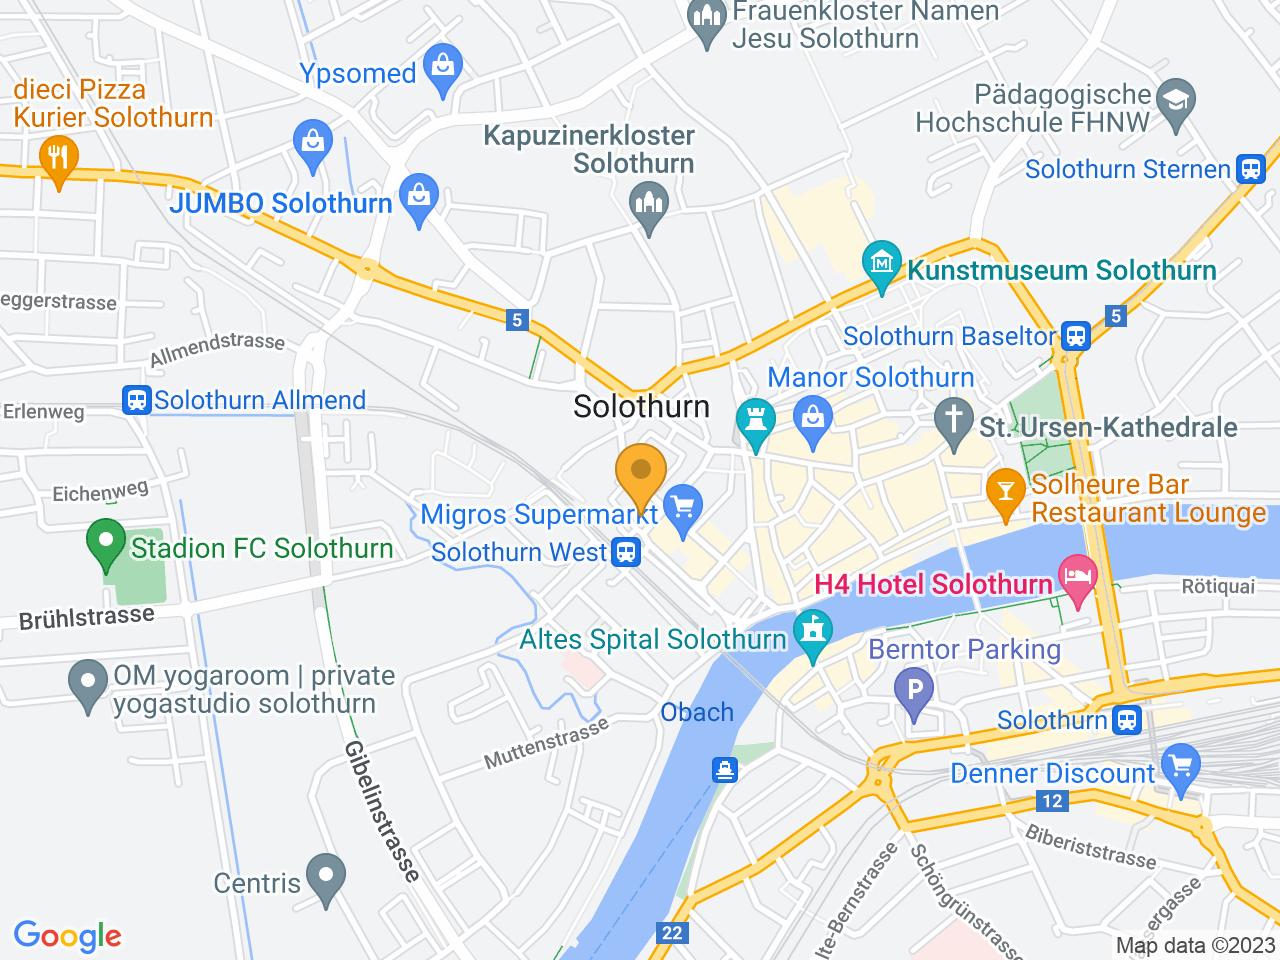 Westbahnhofstrasse 1, 4500 Solothurn